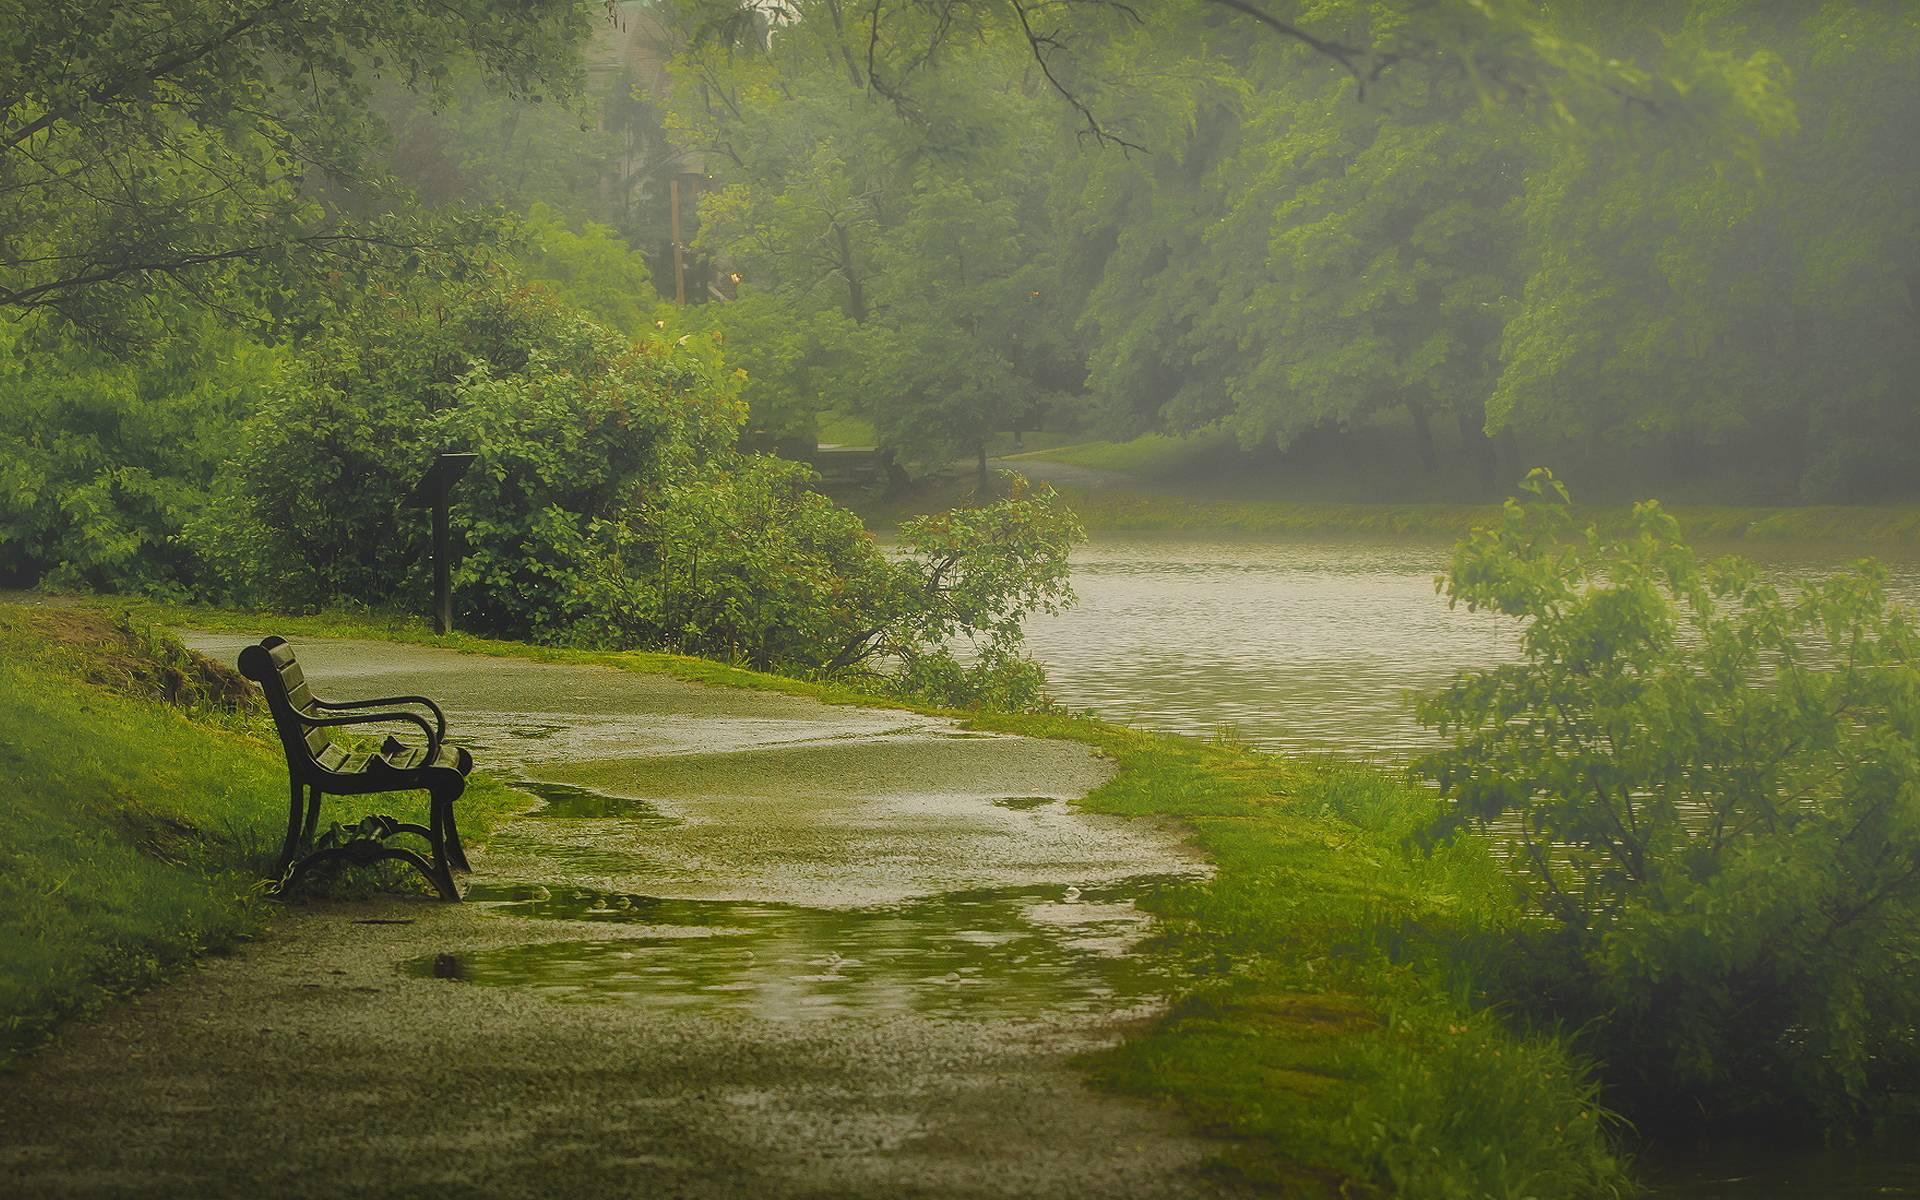 Rain-HD-Backgrounds-wallpaper-wpc580259